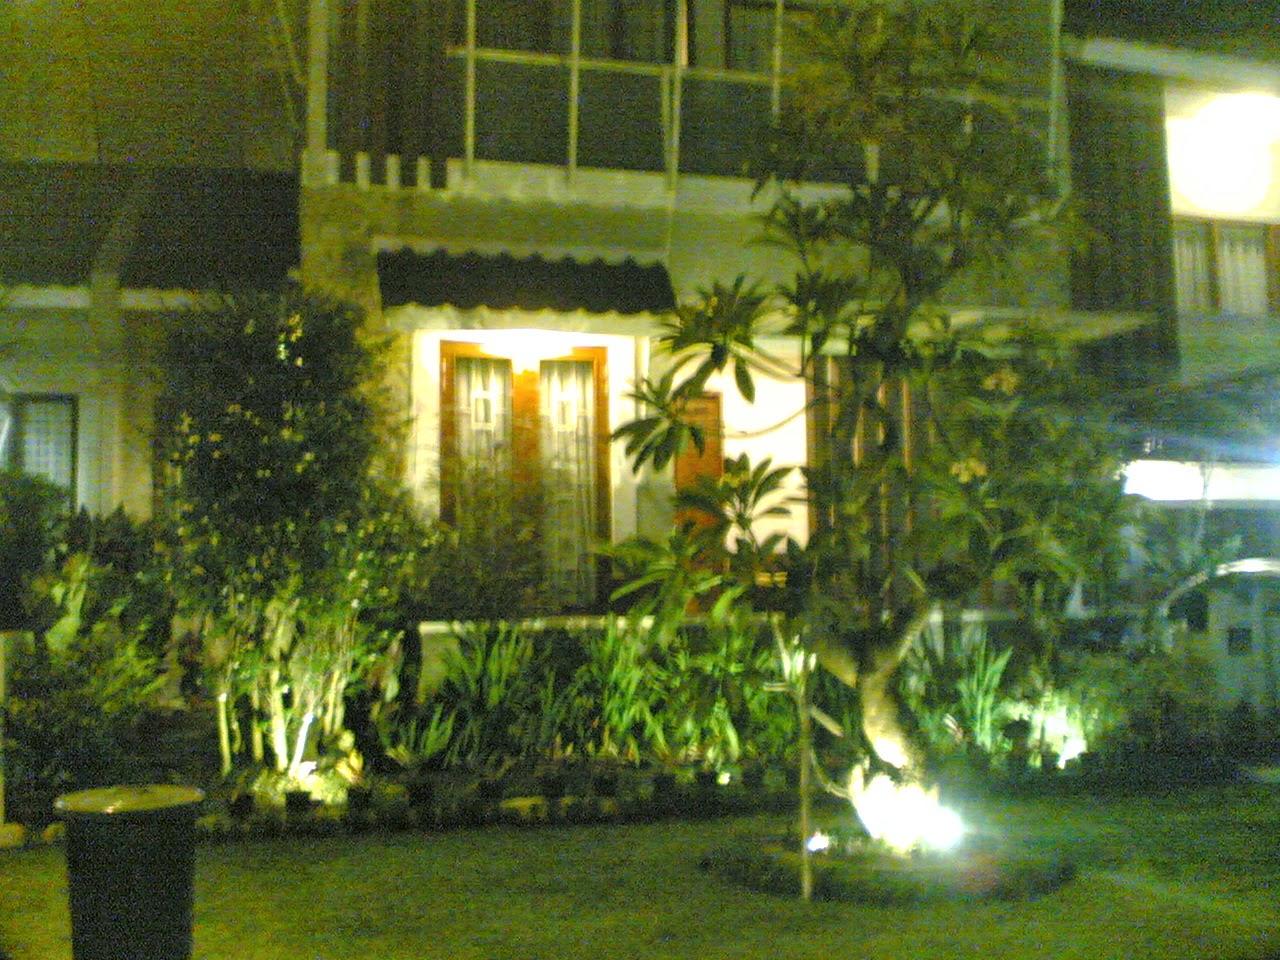 Tukang taman jabodetabek | Renovasi taman | Kontraktor taman | Suplier tanaman hias | Rumput | Kolam minimalis | Saung gazebo